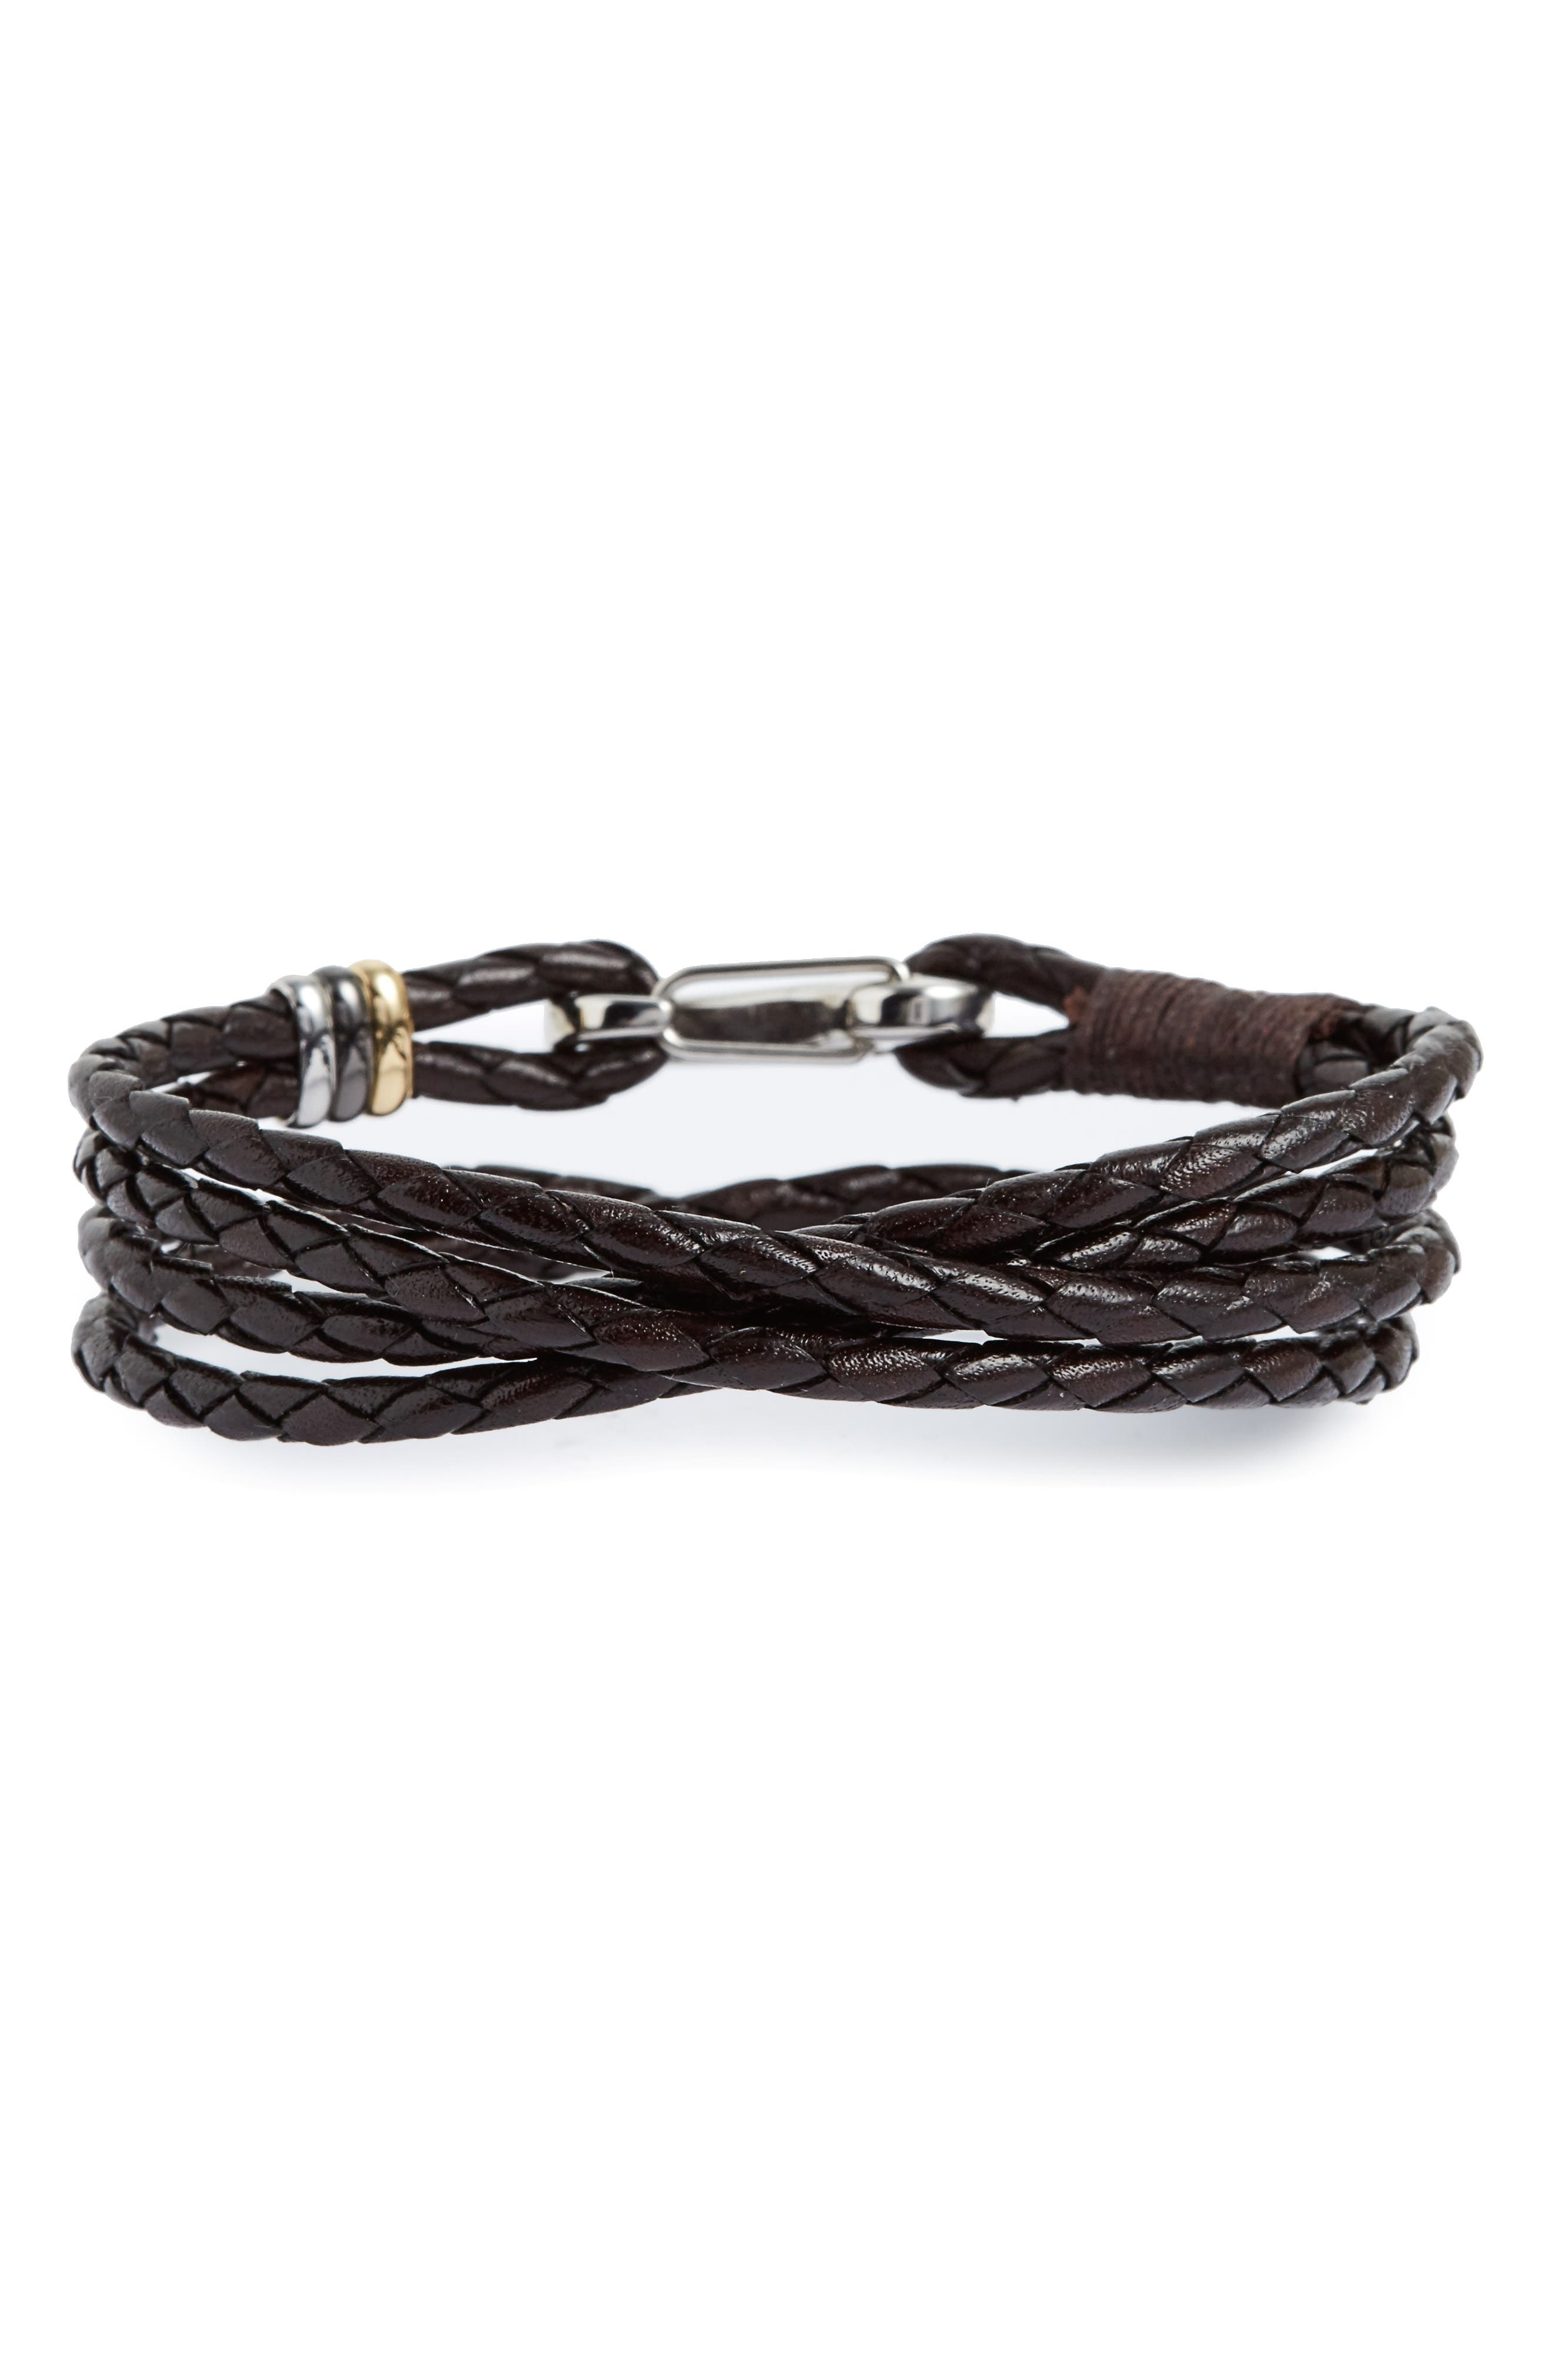 Braided Leather Wrap Bracelet,                         Main,                         color, Chocolate